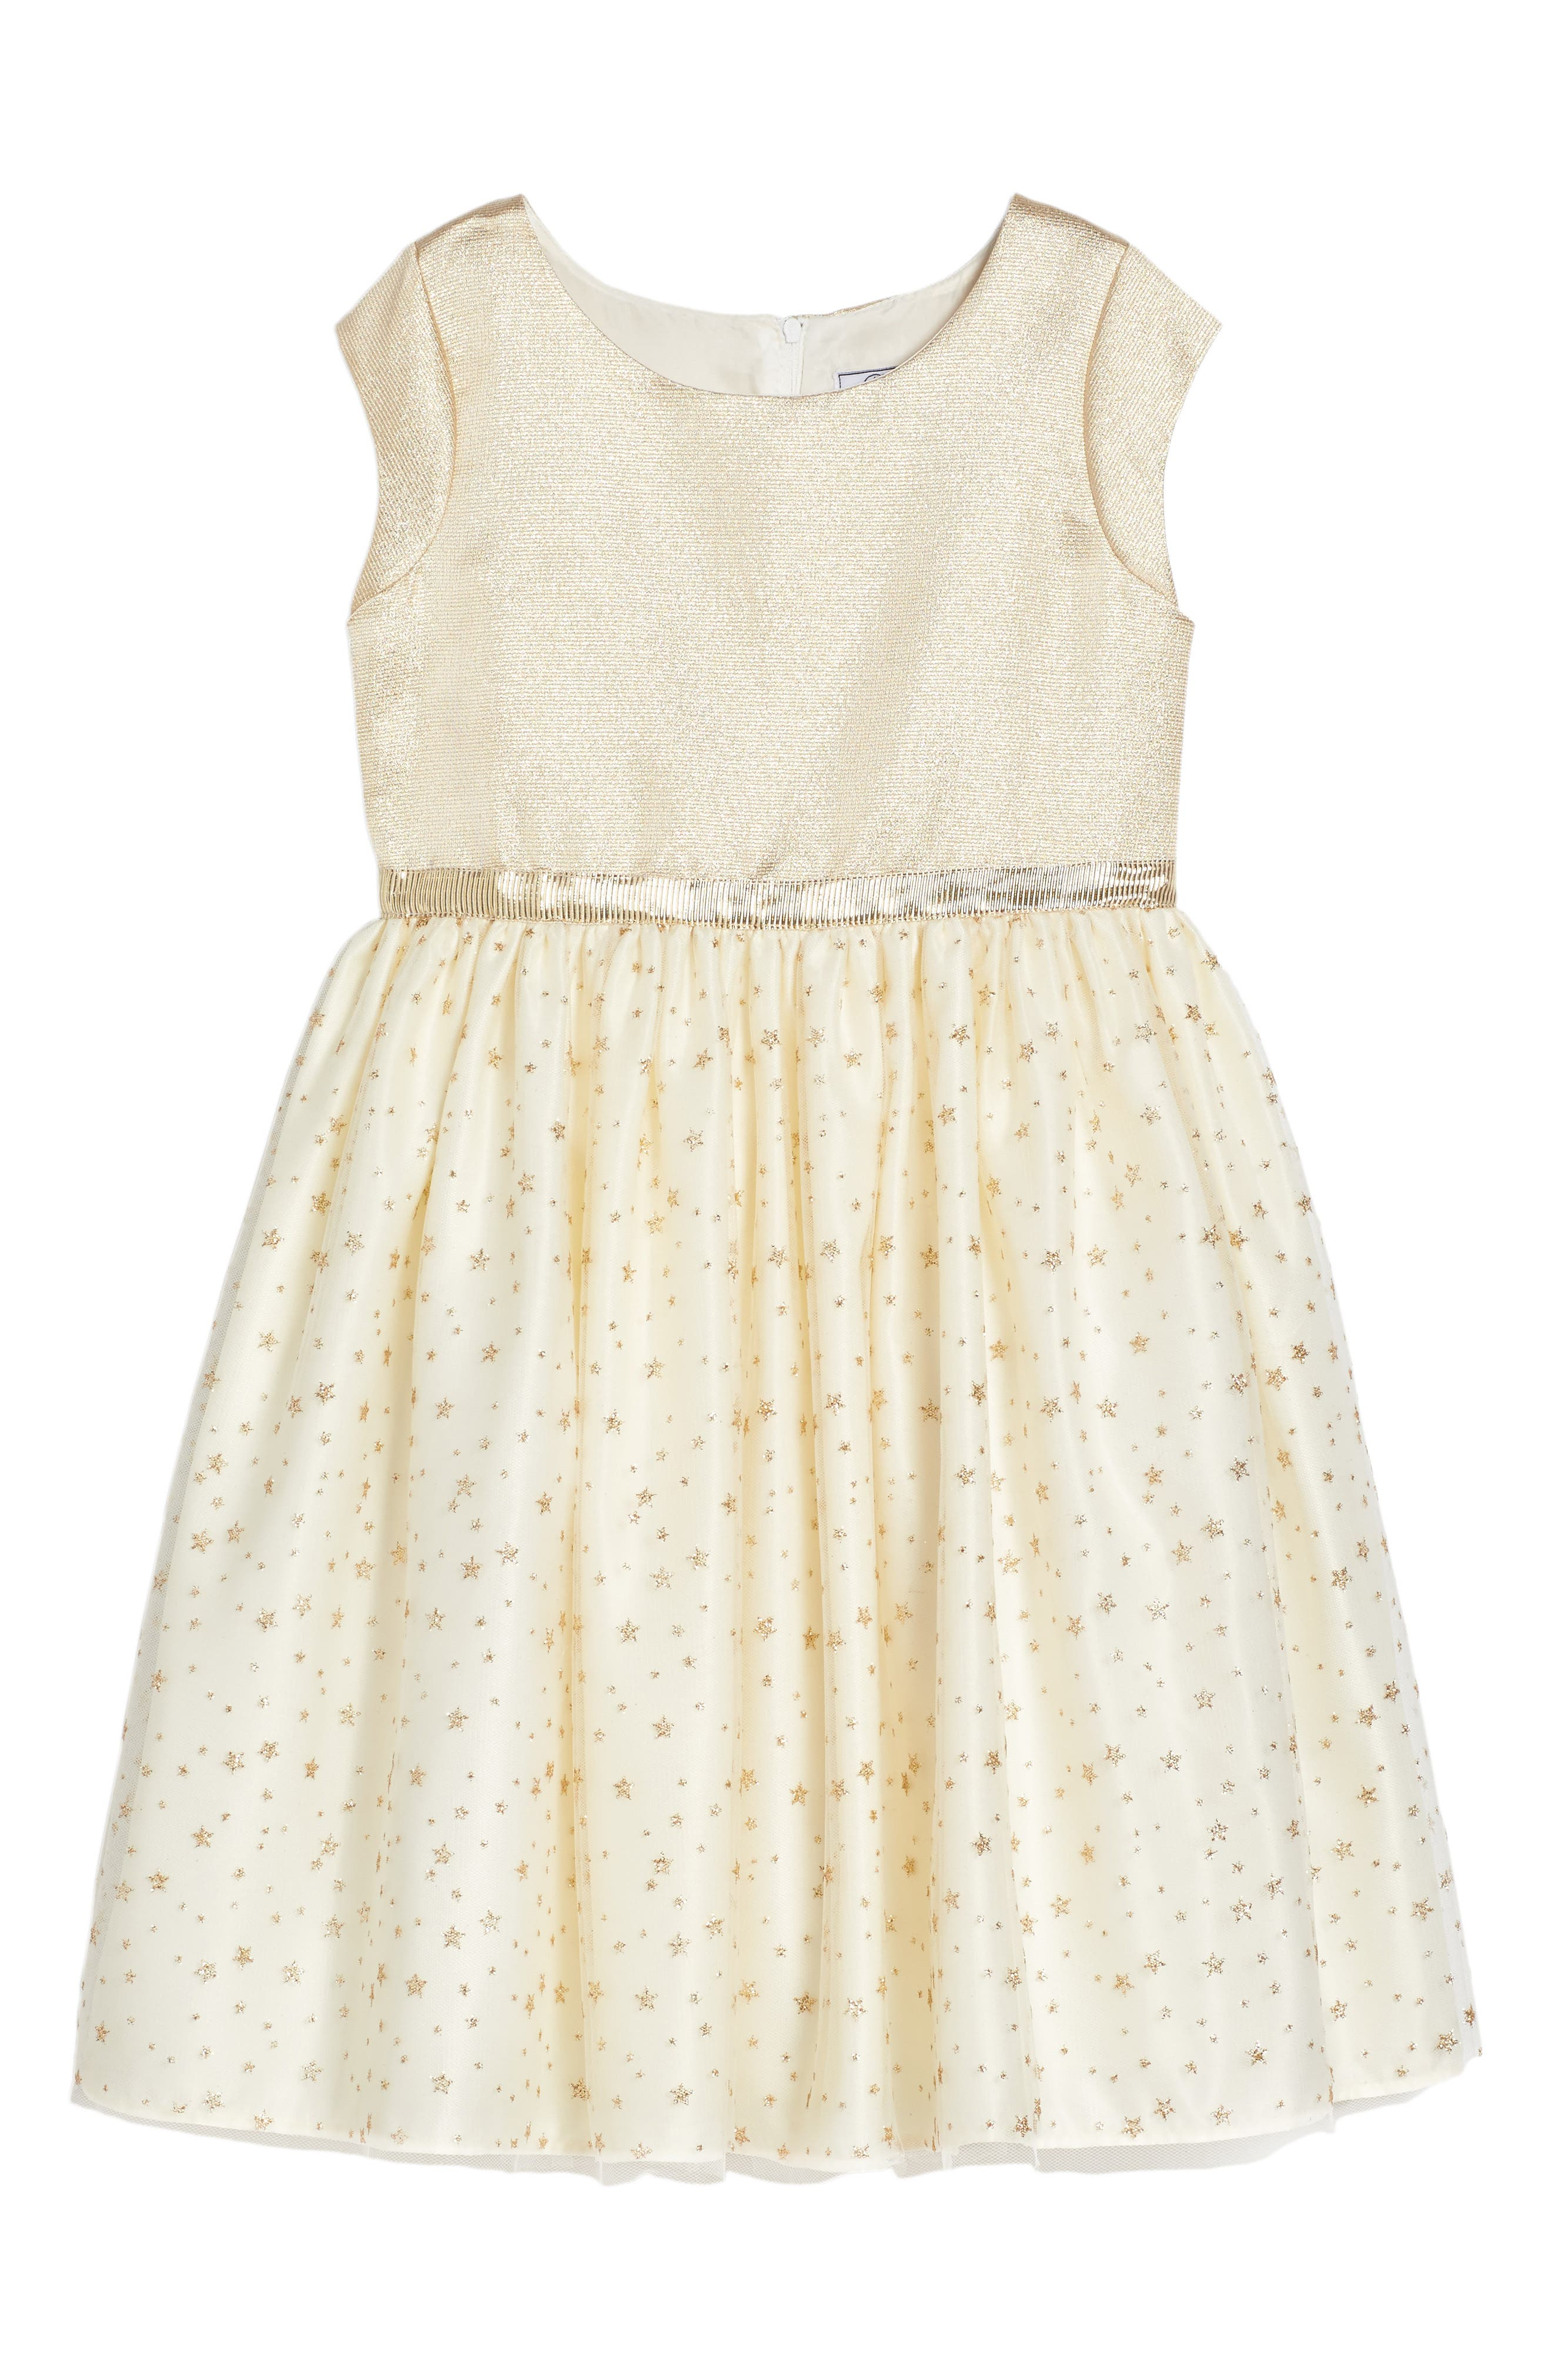 Main Image - Dorissa Kelly Dress (Toddler Girls, Little Girls & Big Girls)